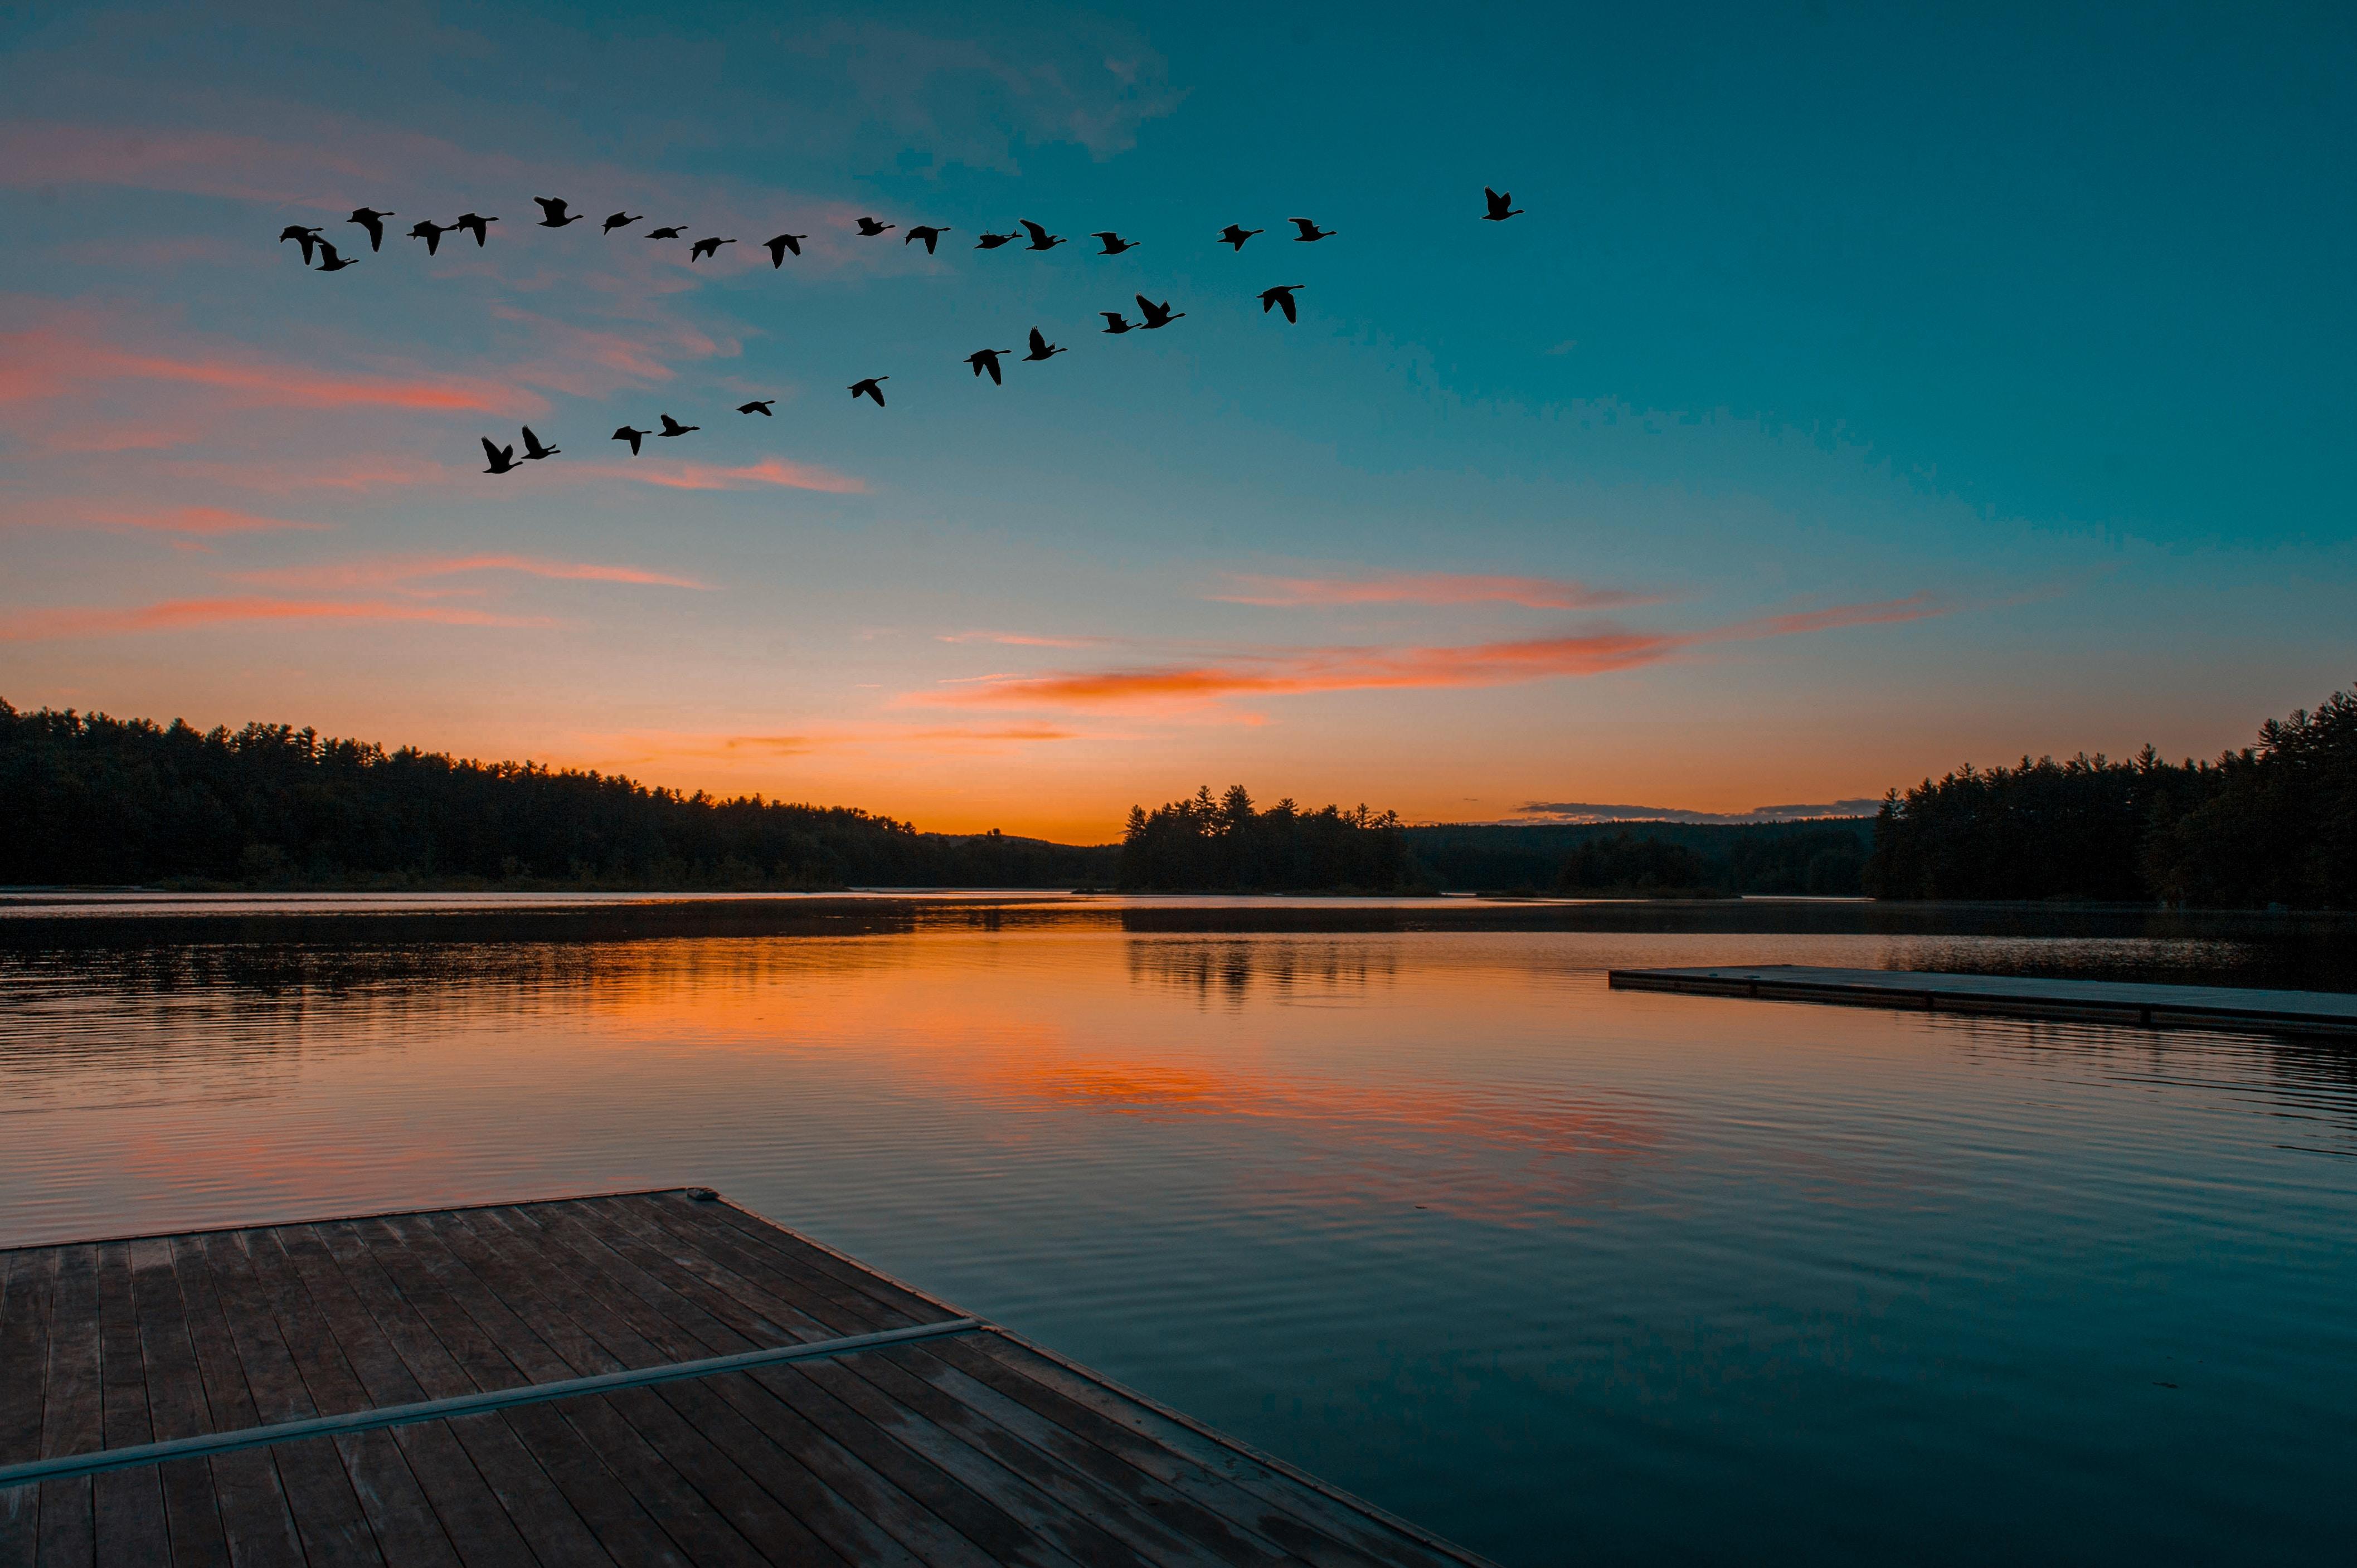 calm body of water under flock of birds flying